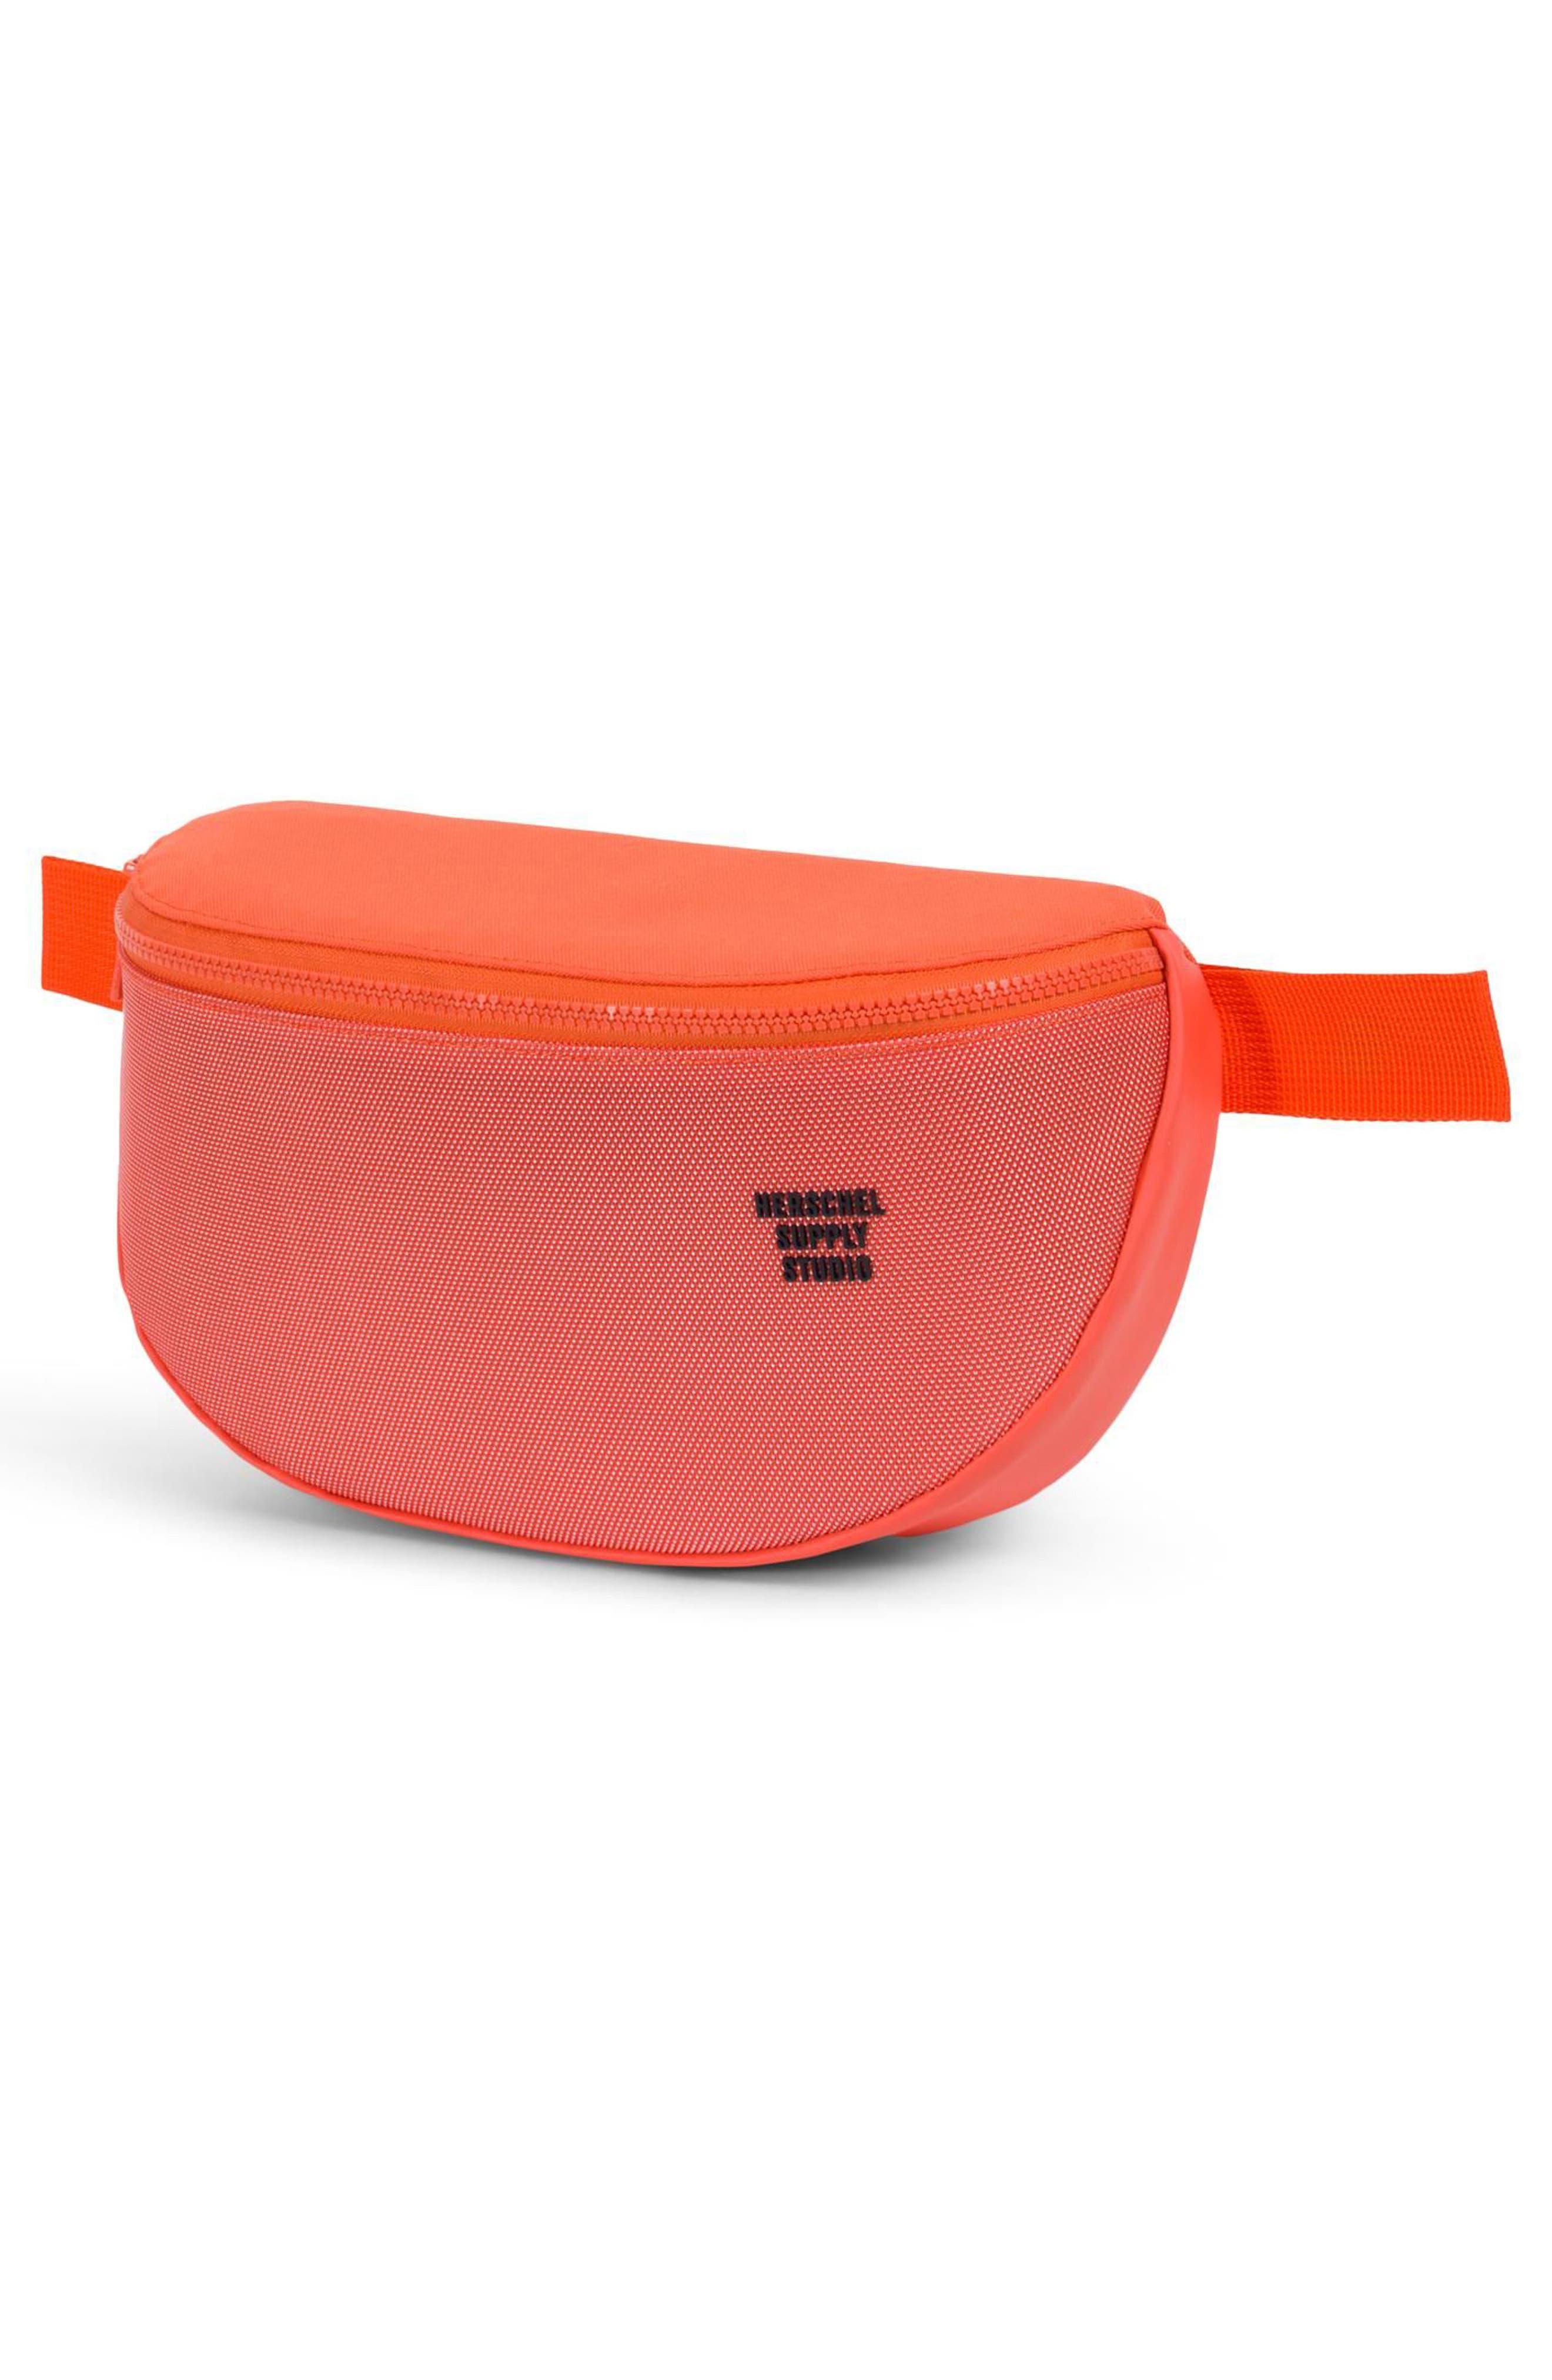 Sixteen Studio Belt Bag,                             Alternate thumbnail 3, color,                             Vermillion Orange